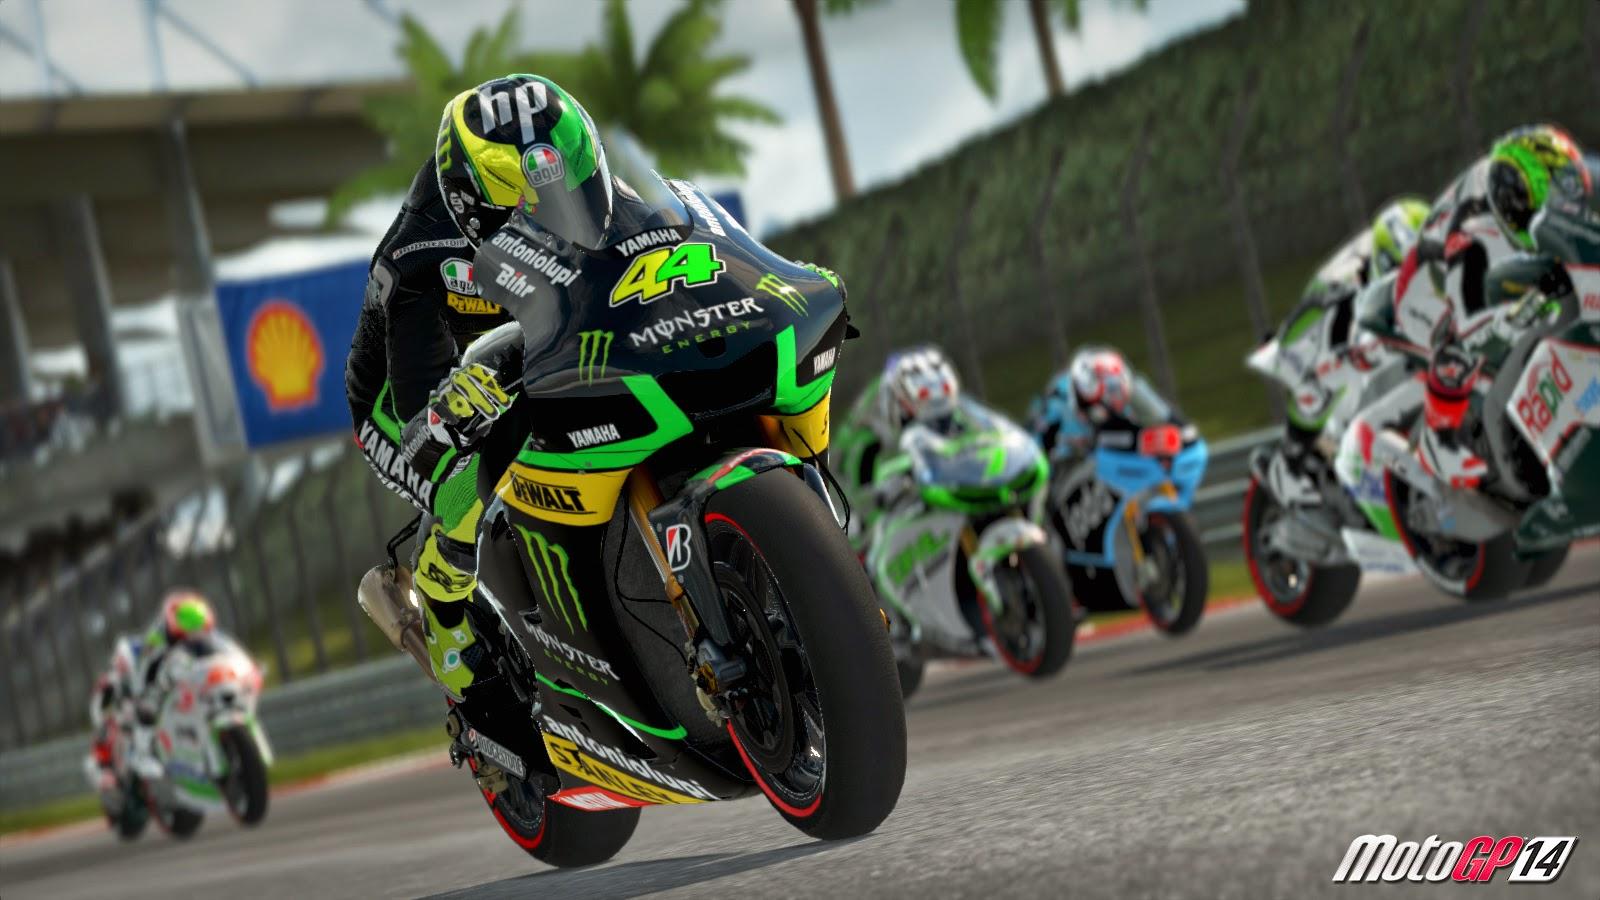 Free Download MotoGP Pc Game Full Crack